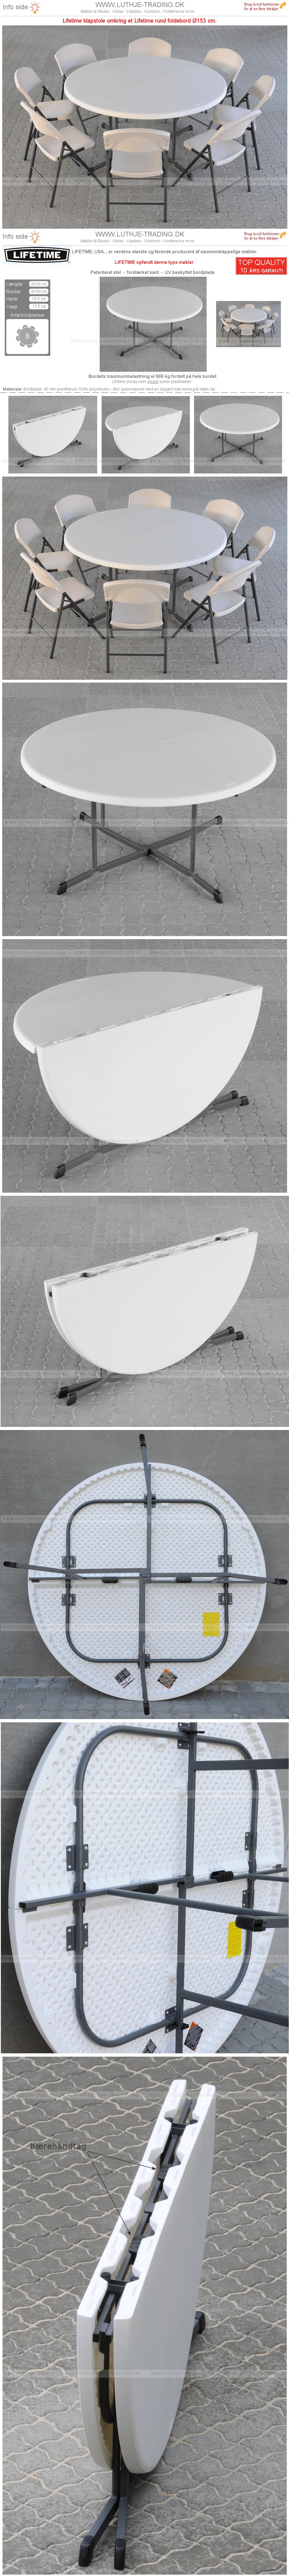 Plaststole med foldebord Ø153 cm